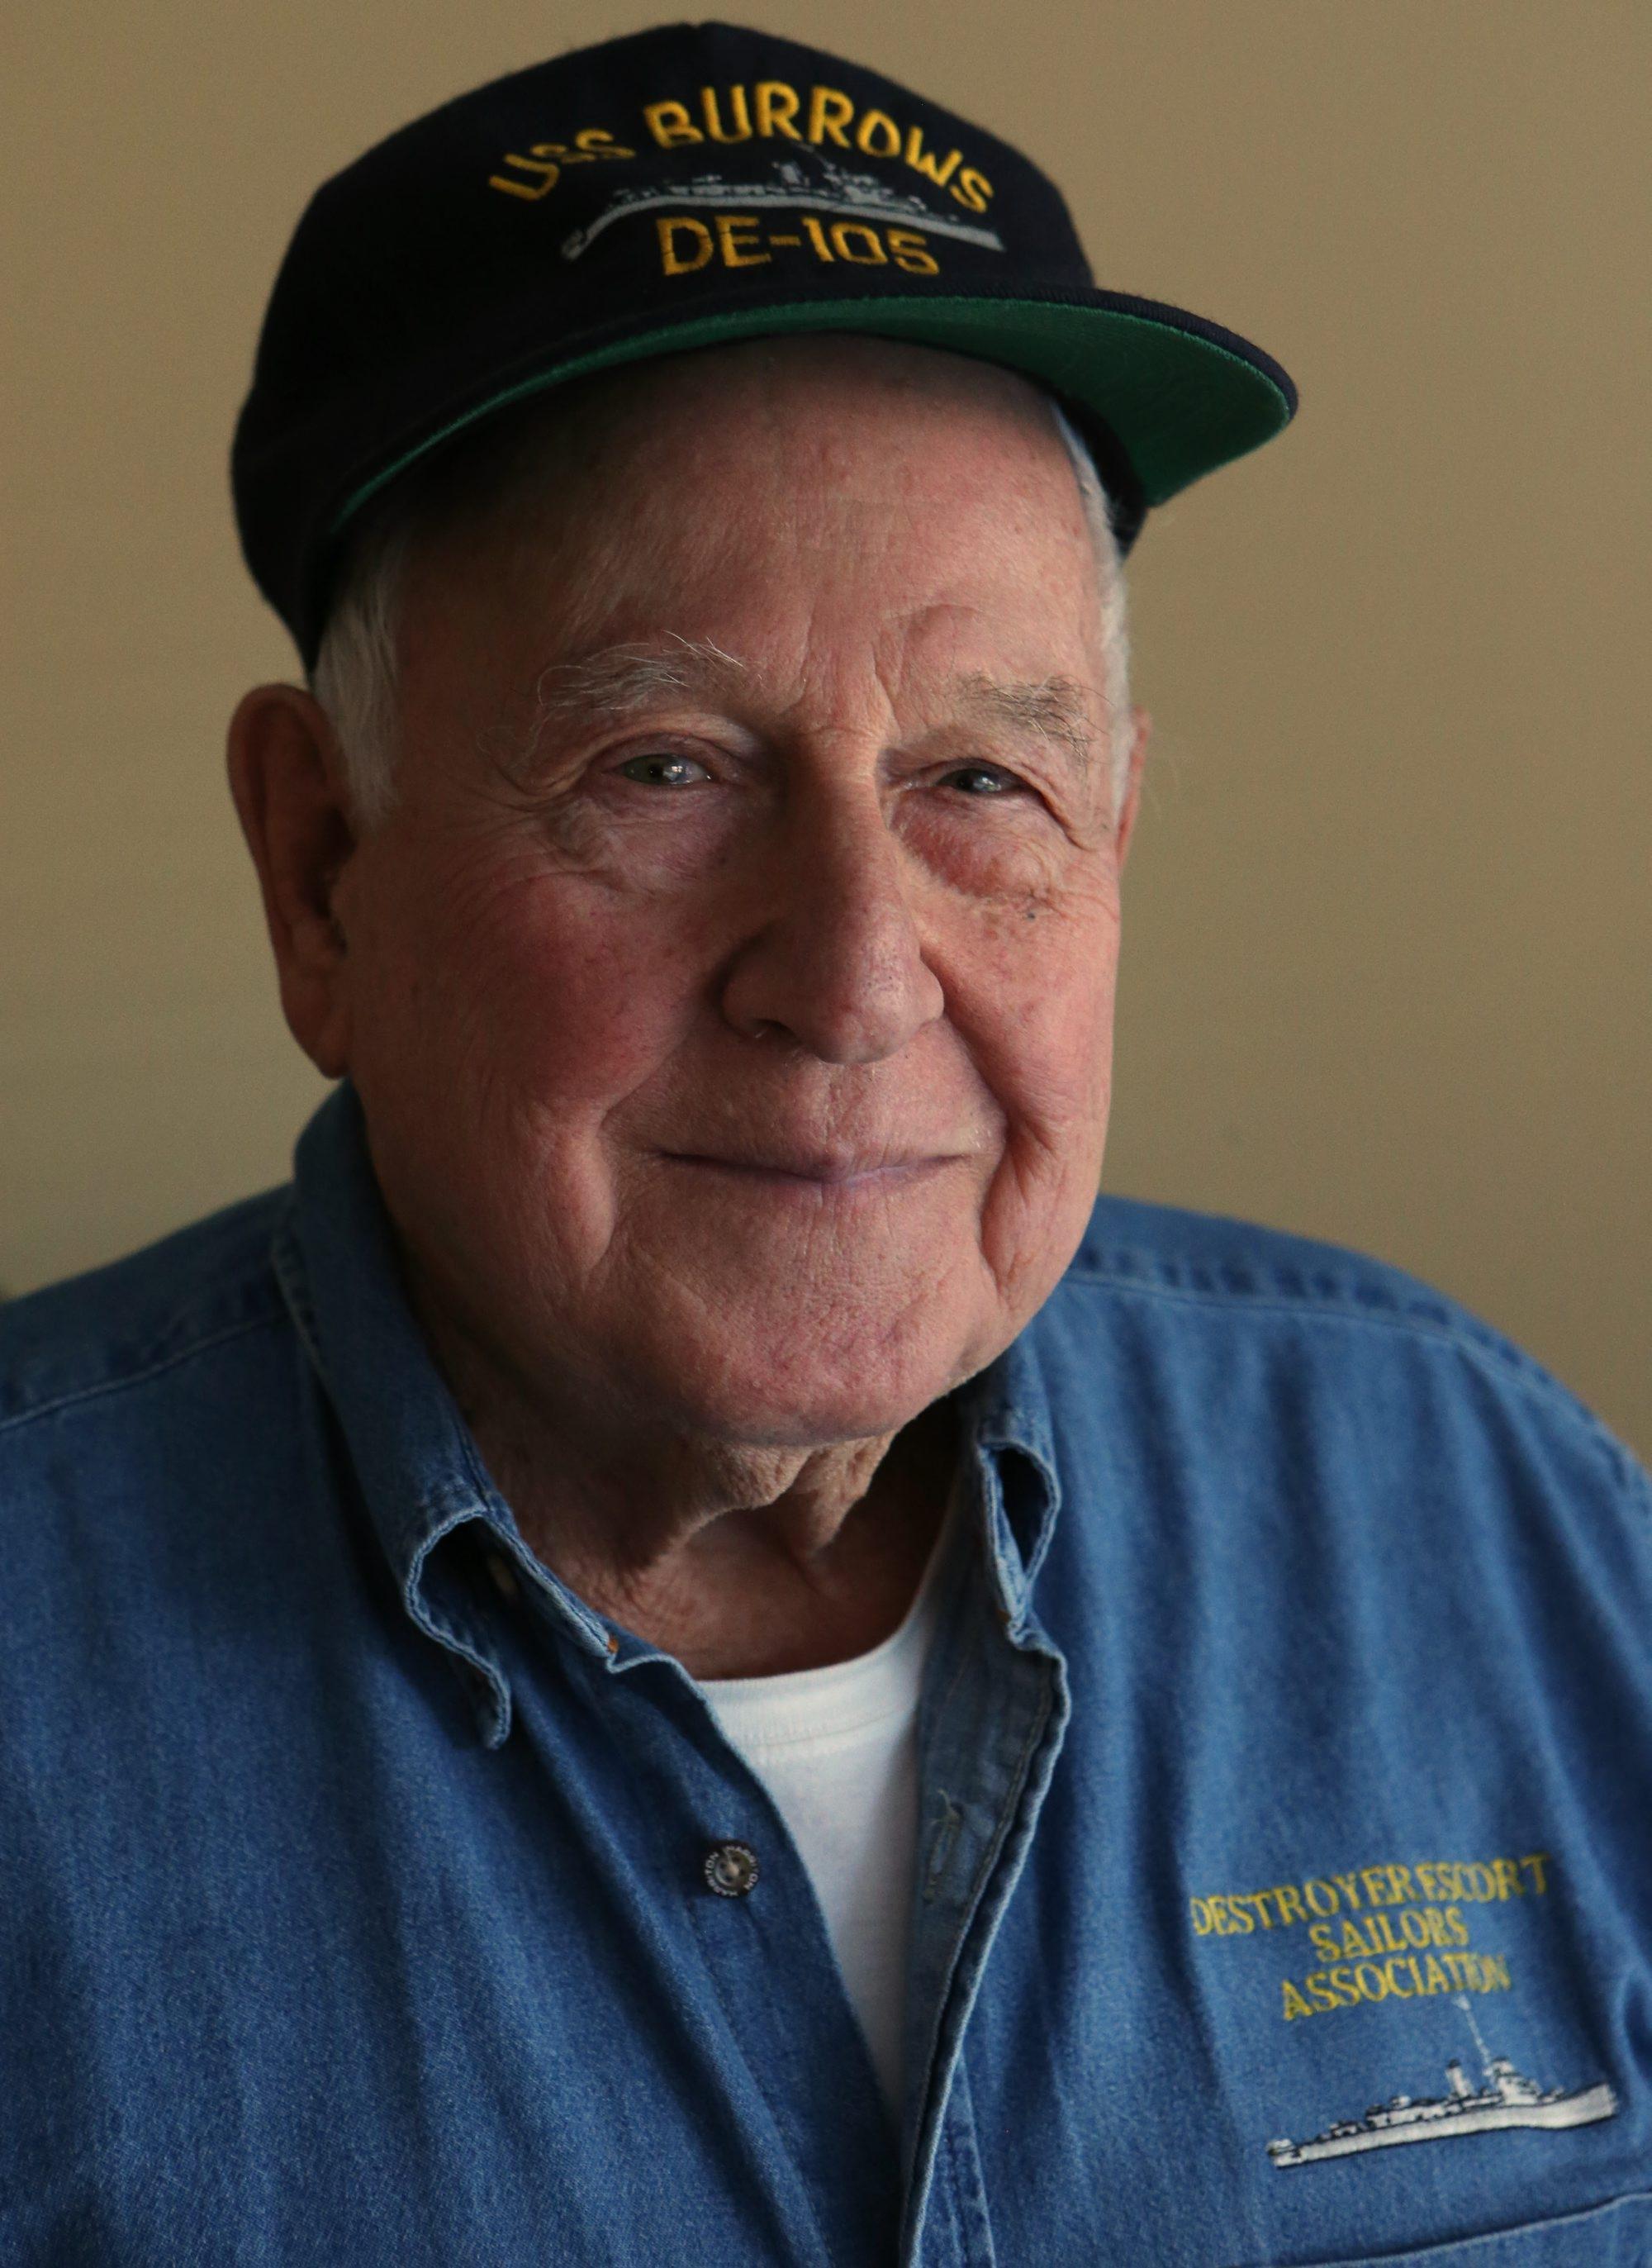 Fran Lucca served as a radioman on a U.S. Navy destroyer escort in World War II.